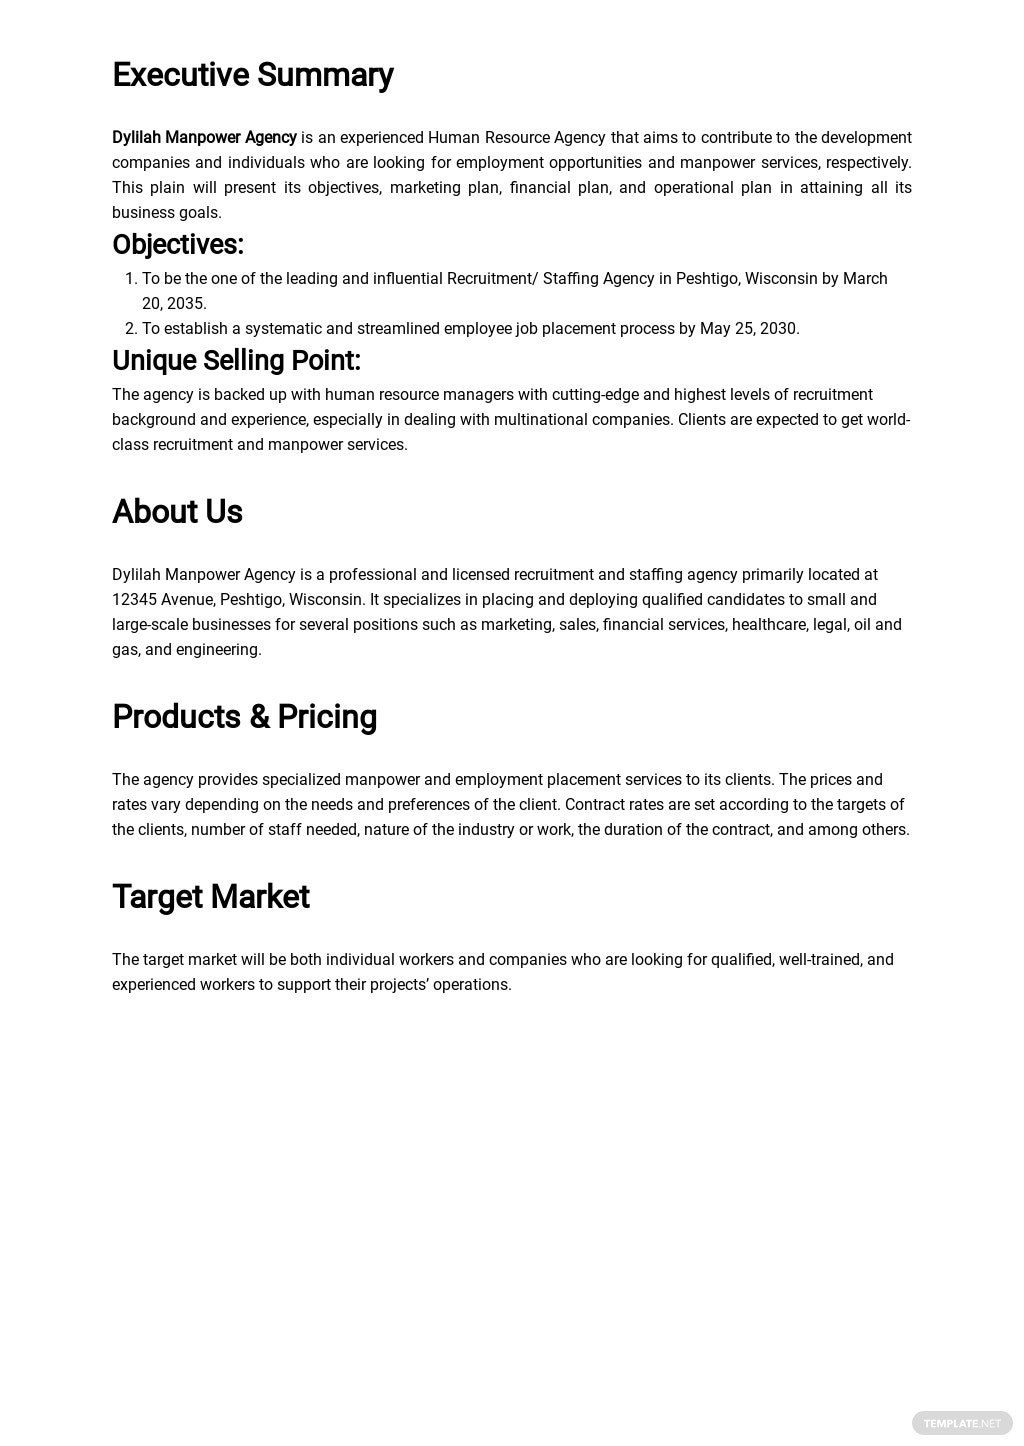 Recruitment/Staffing Agency Business Plan Template 1.jpe